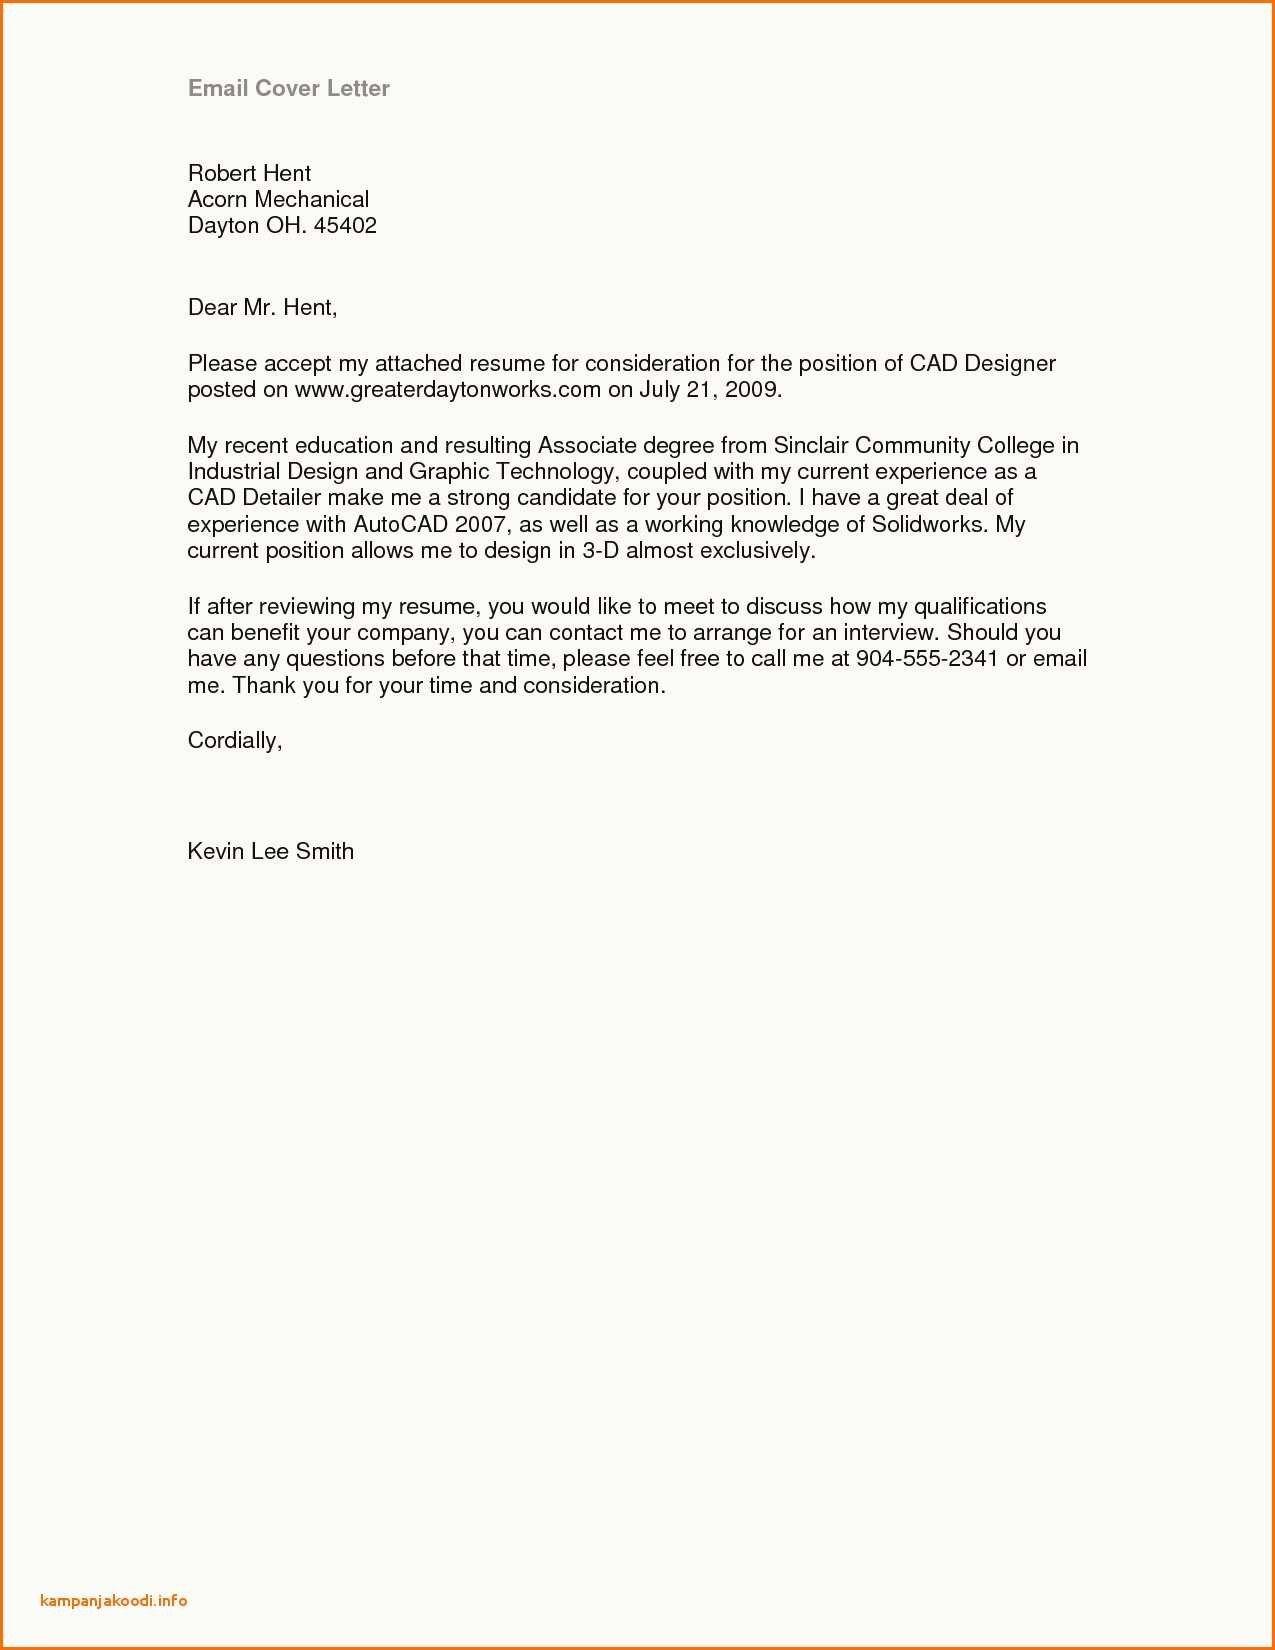 Resume Format For Job Application Letter